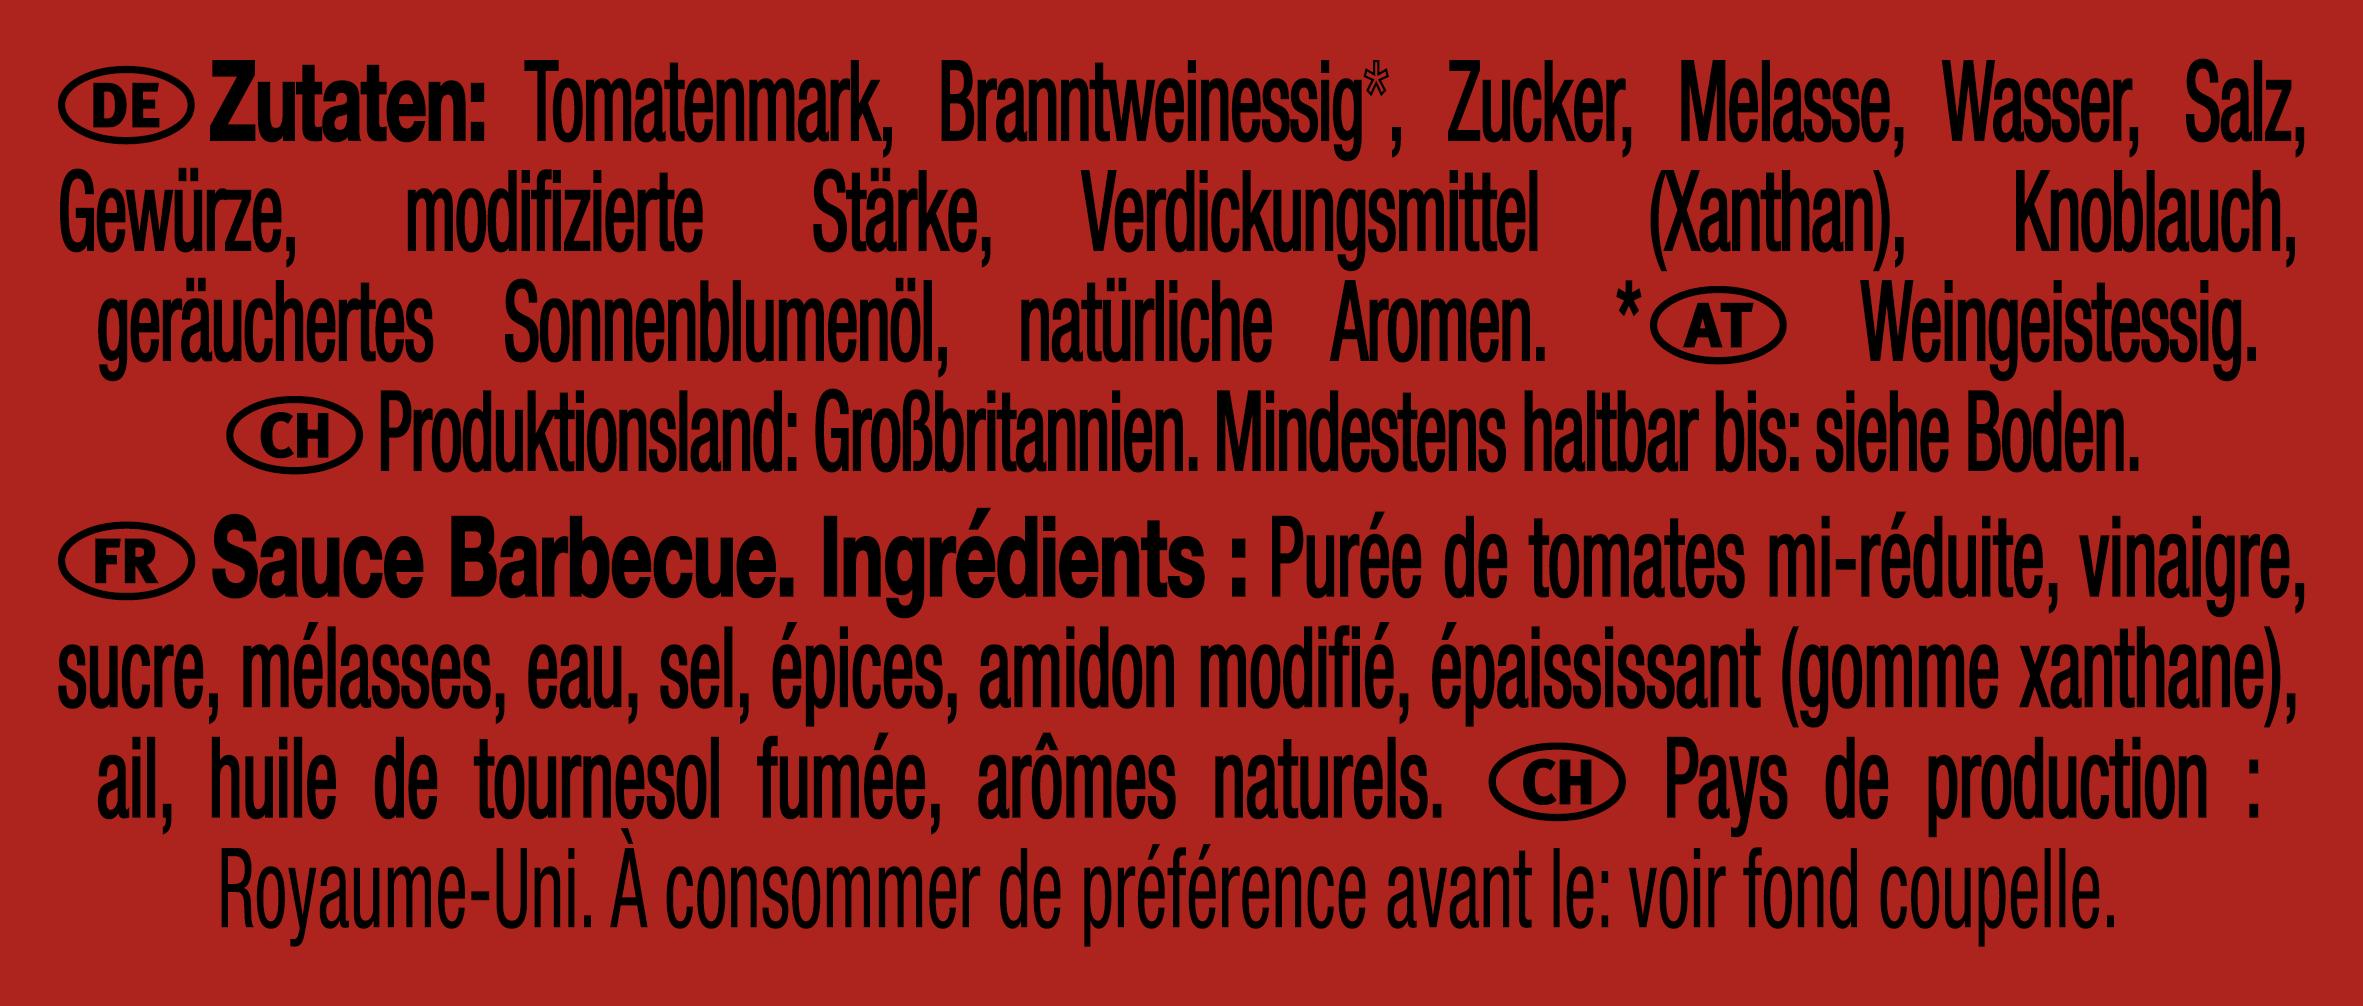 Heinz Barbecue 25g Coupelle